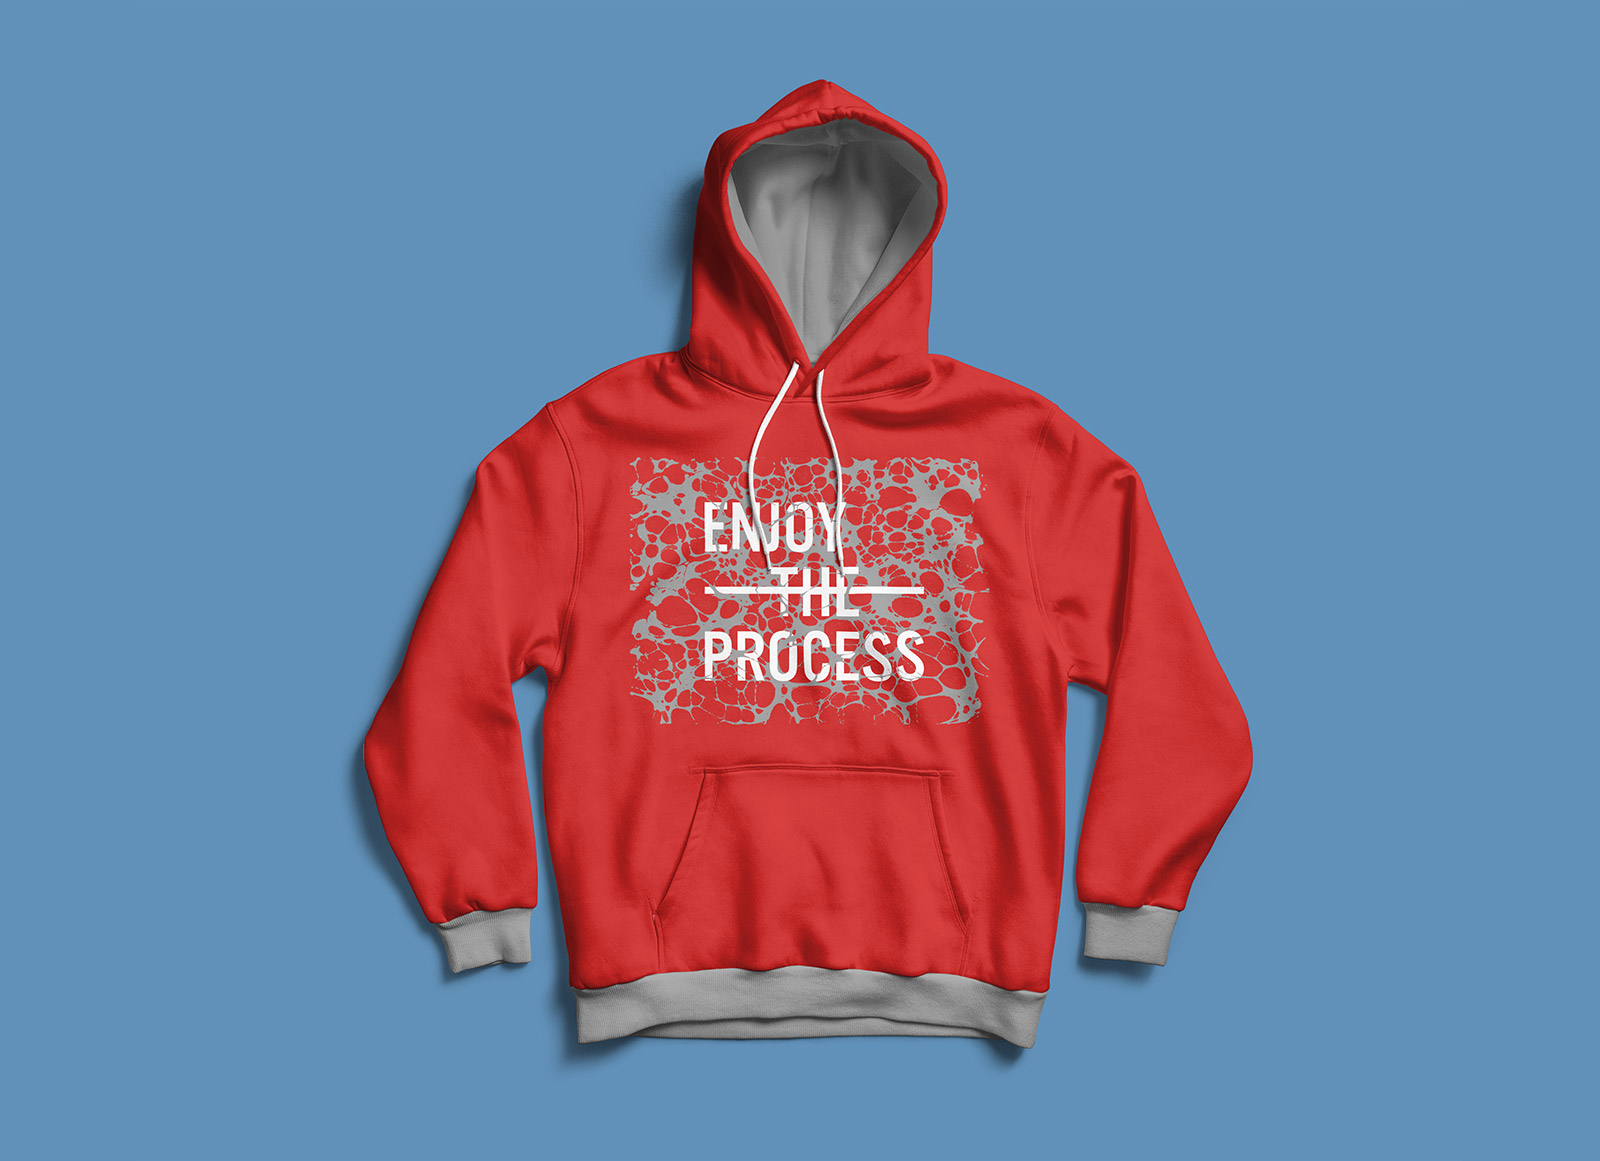 free full sleeves hoodie t shirt mockup psd good mockups